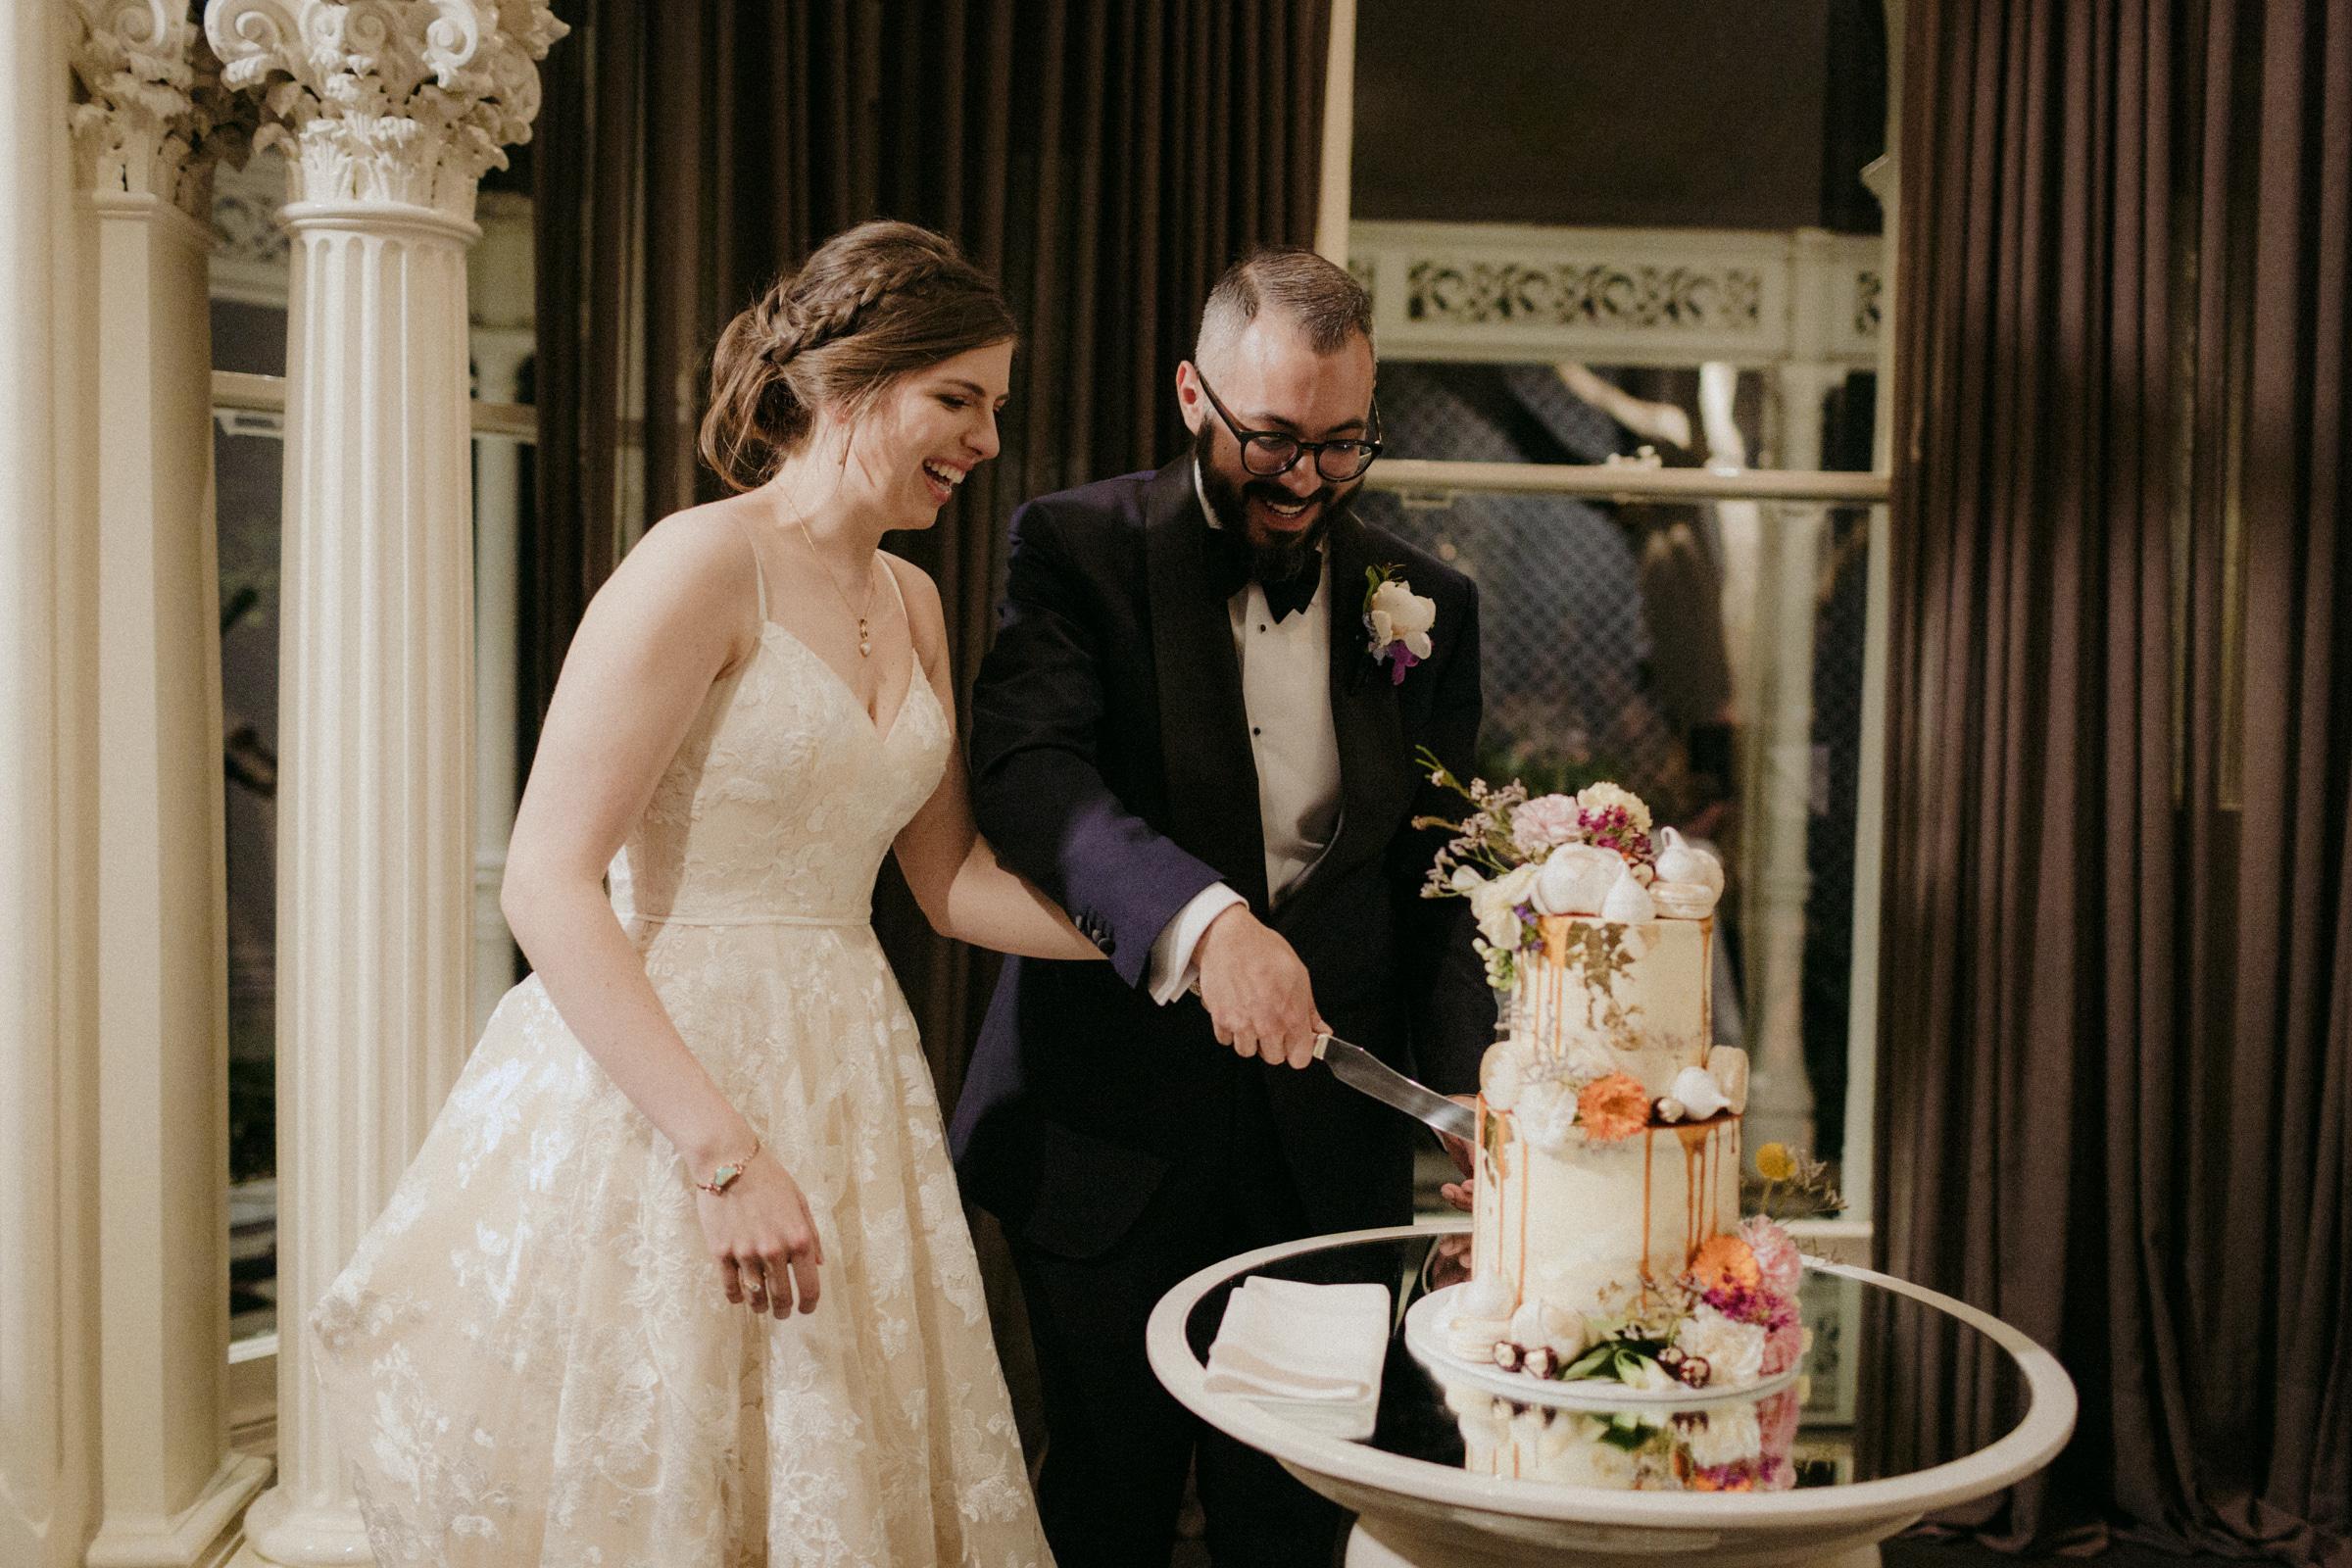 Nick & Lucinda Cake: @jycakedesigns